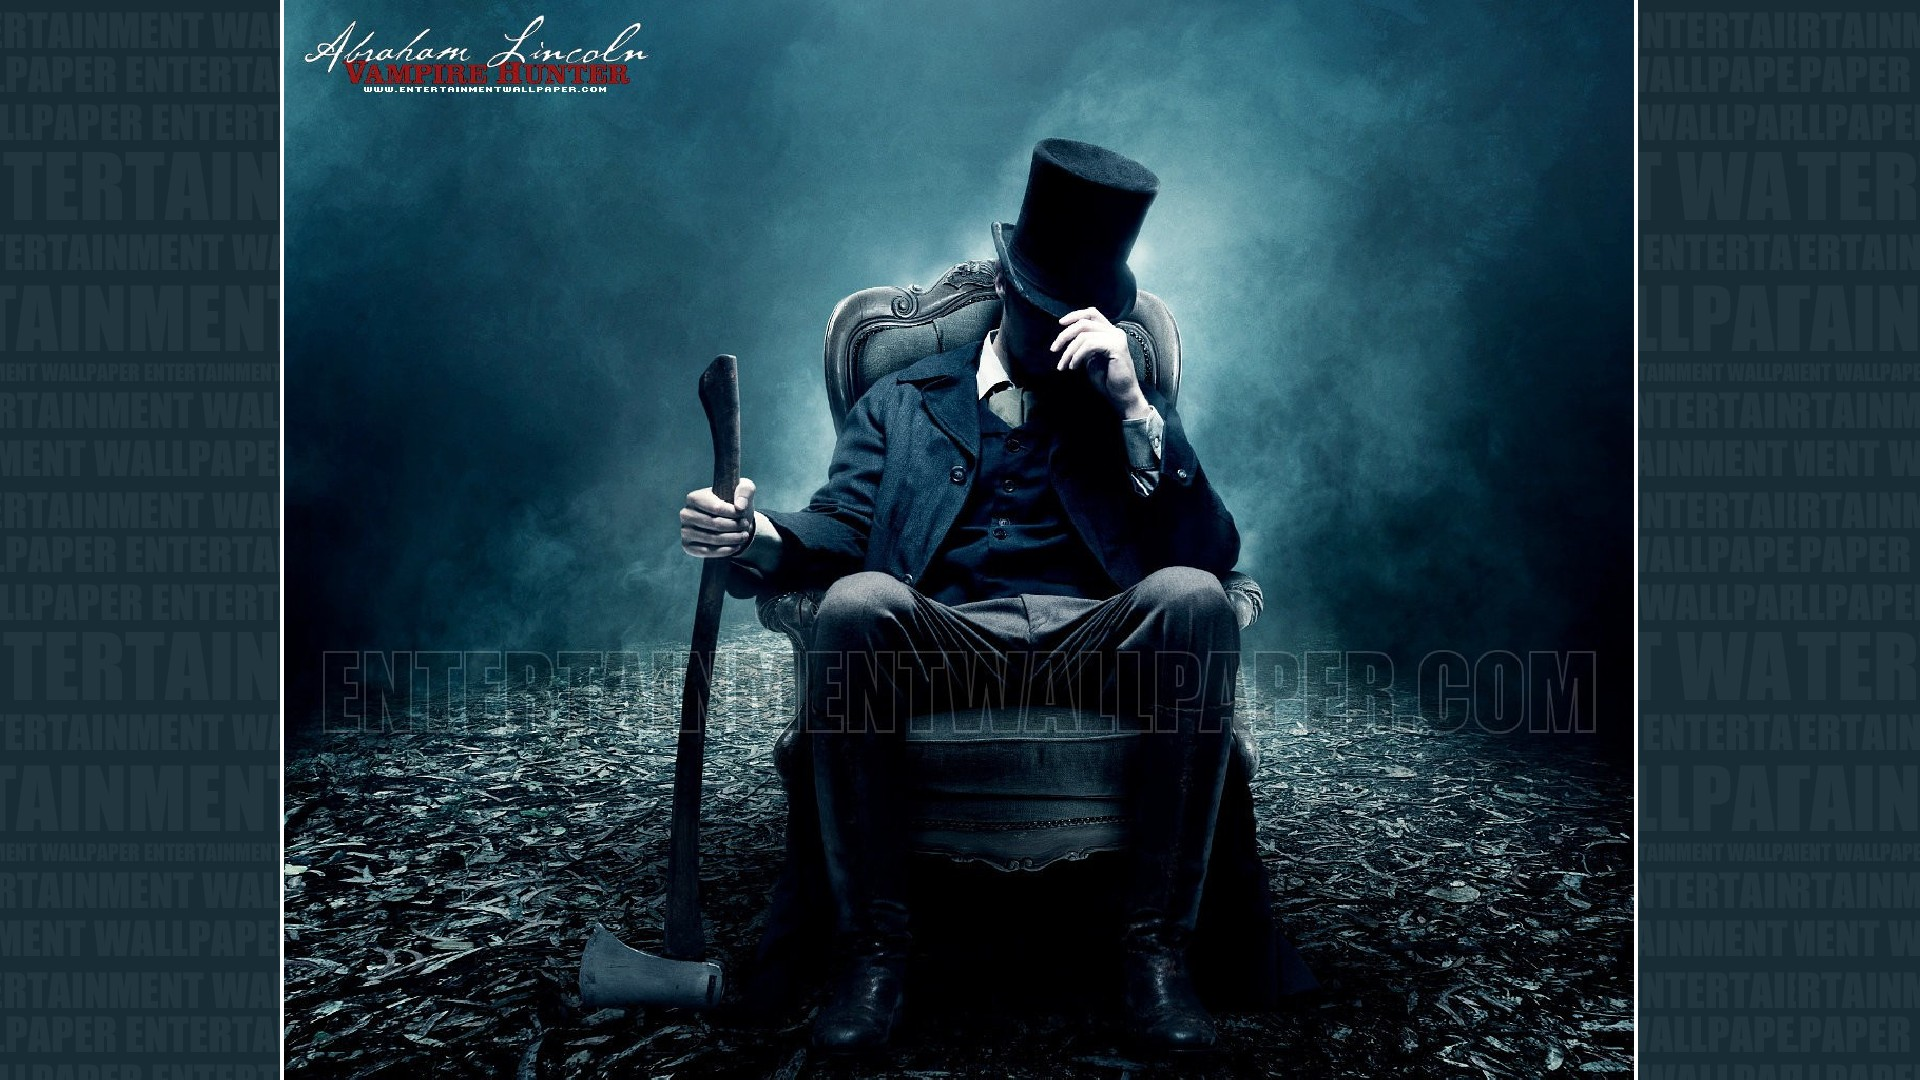 Abraham Lincoln Vampire Hunter Wallpaper   10030334 1920x1080